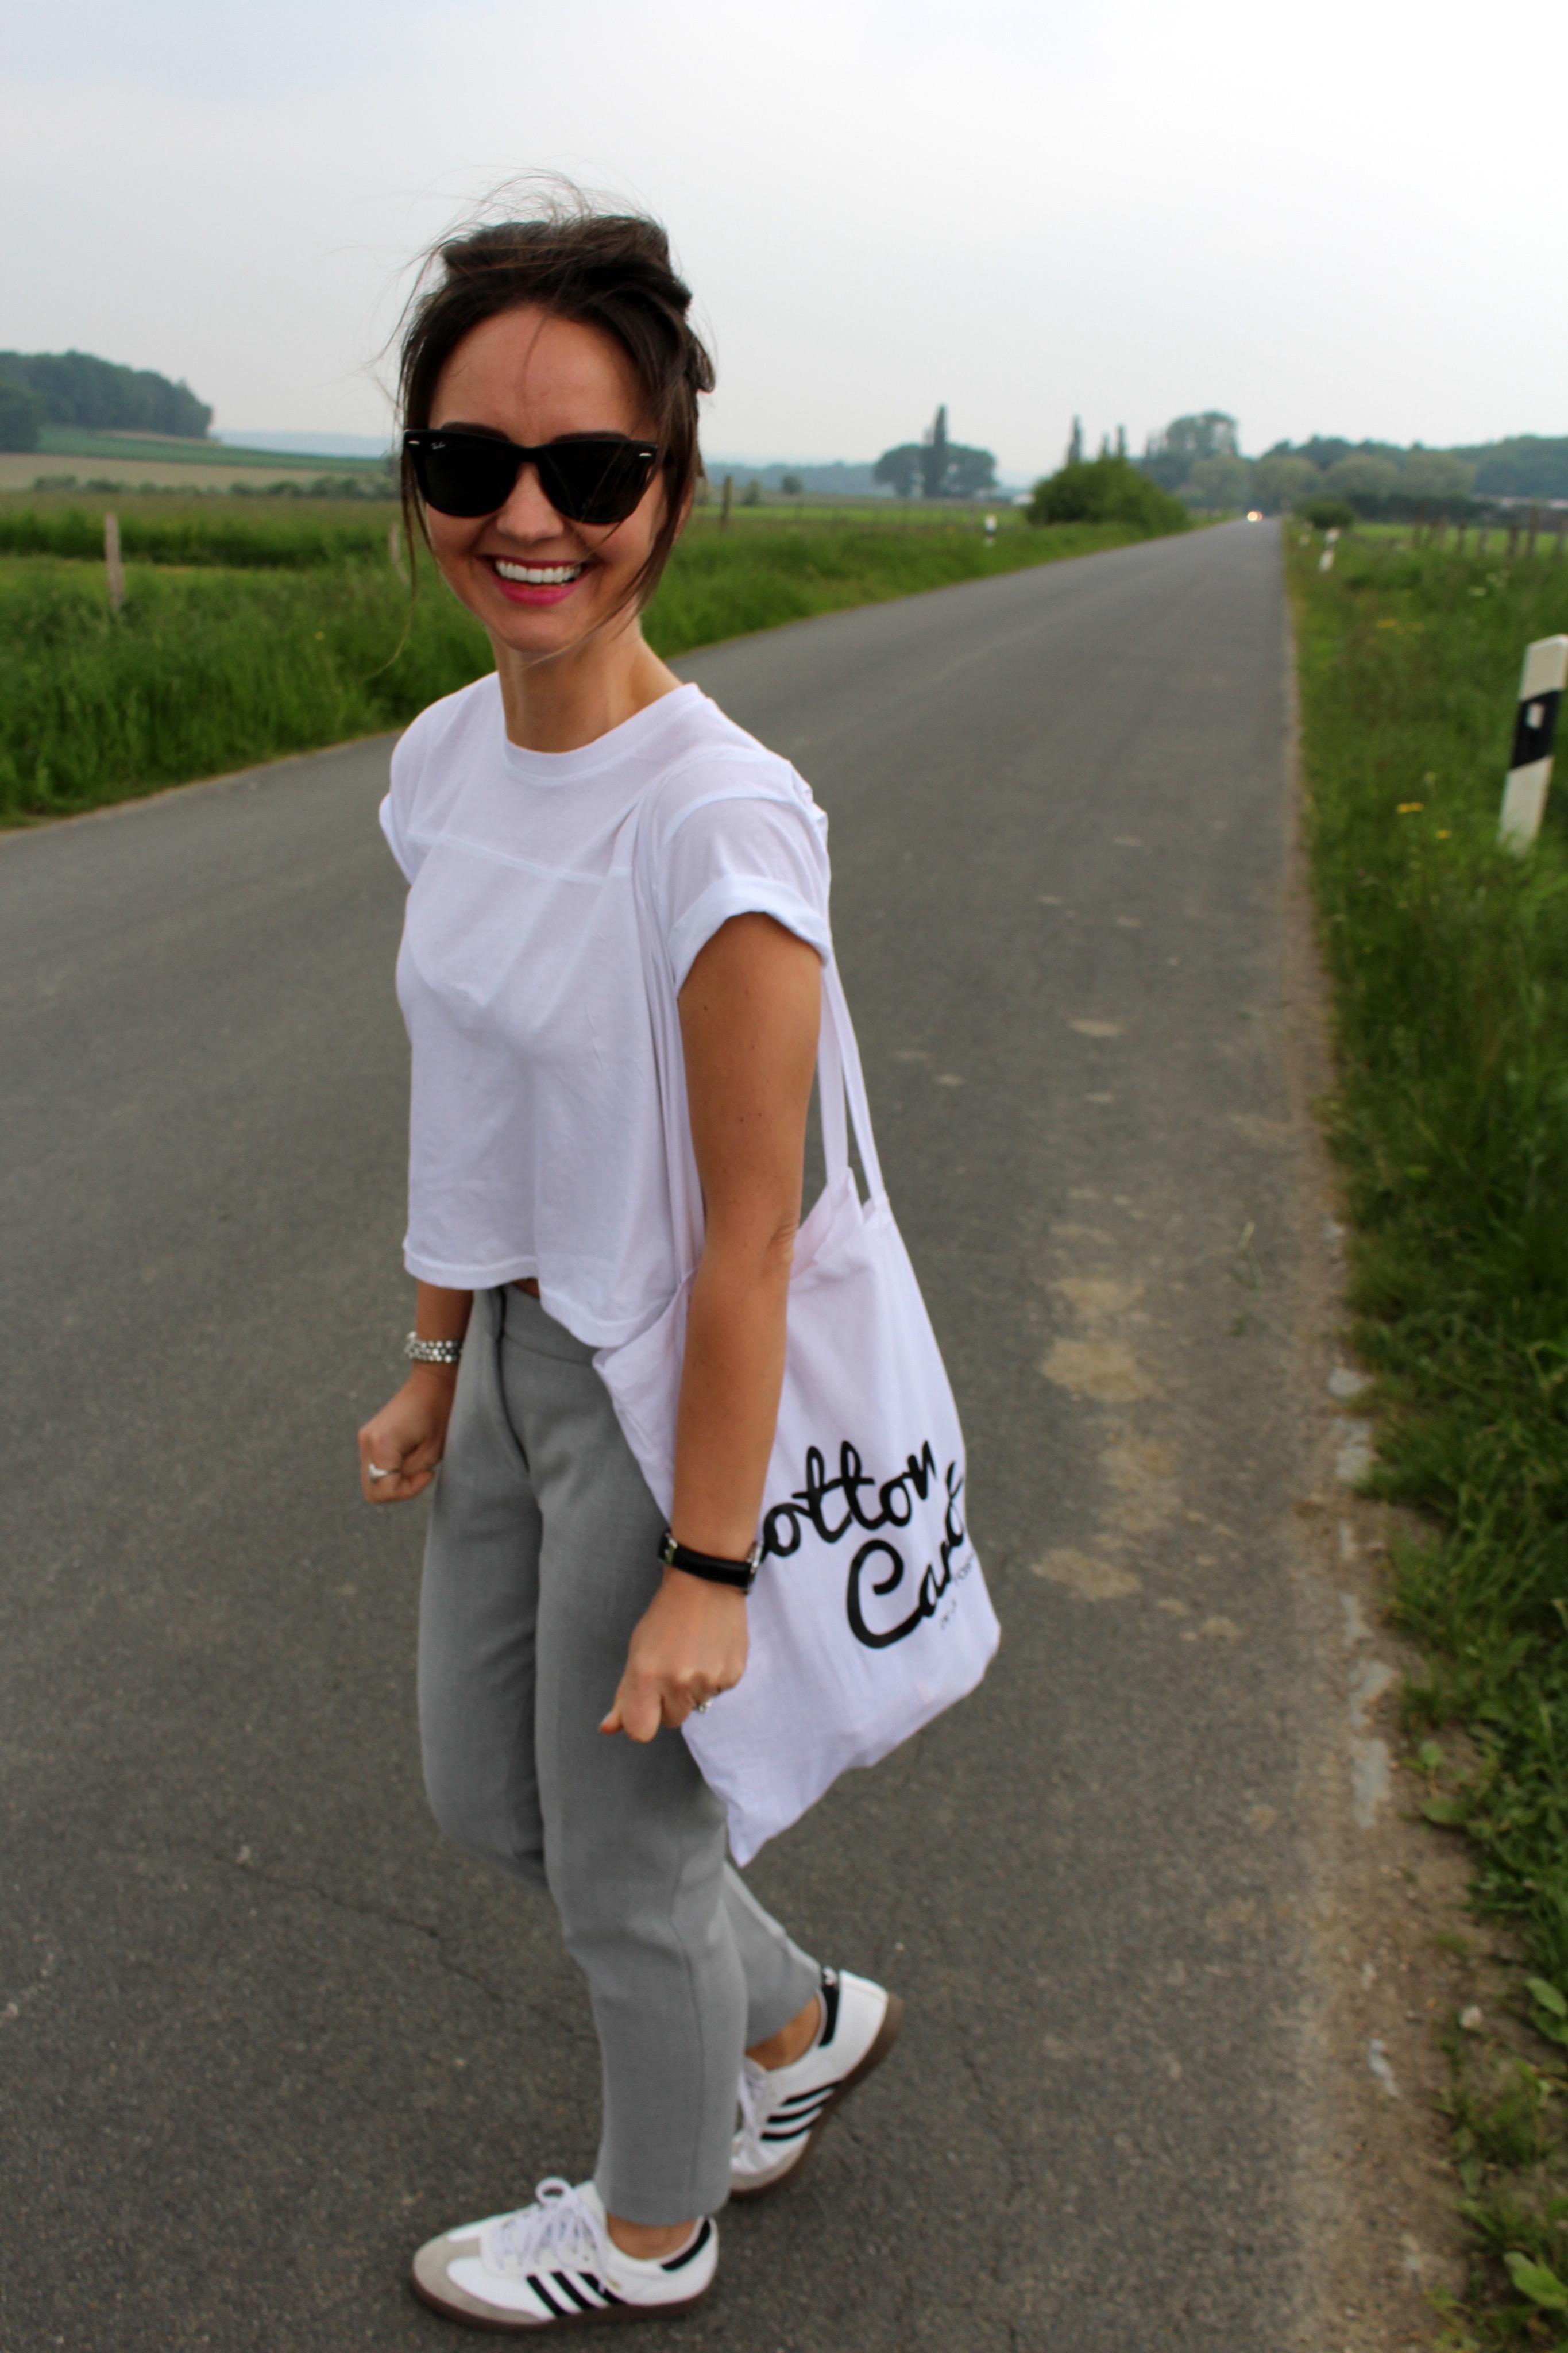 Fashioncircuz by Jenny img_6880 EIN GANZ NORMALER SAMSTAG